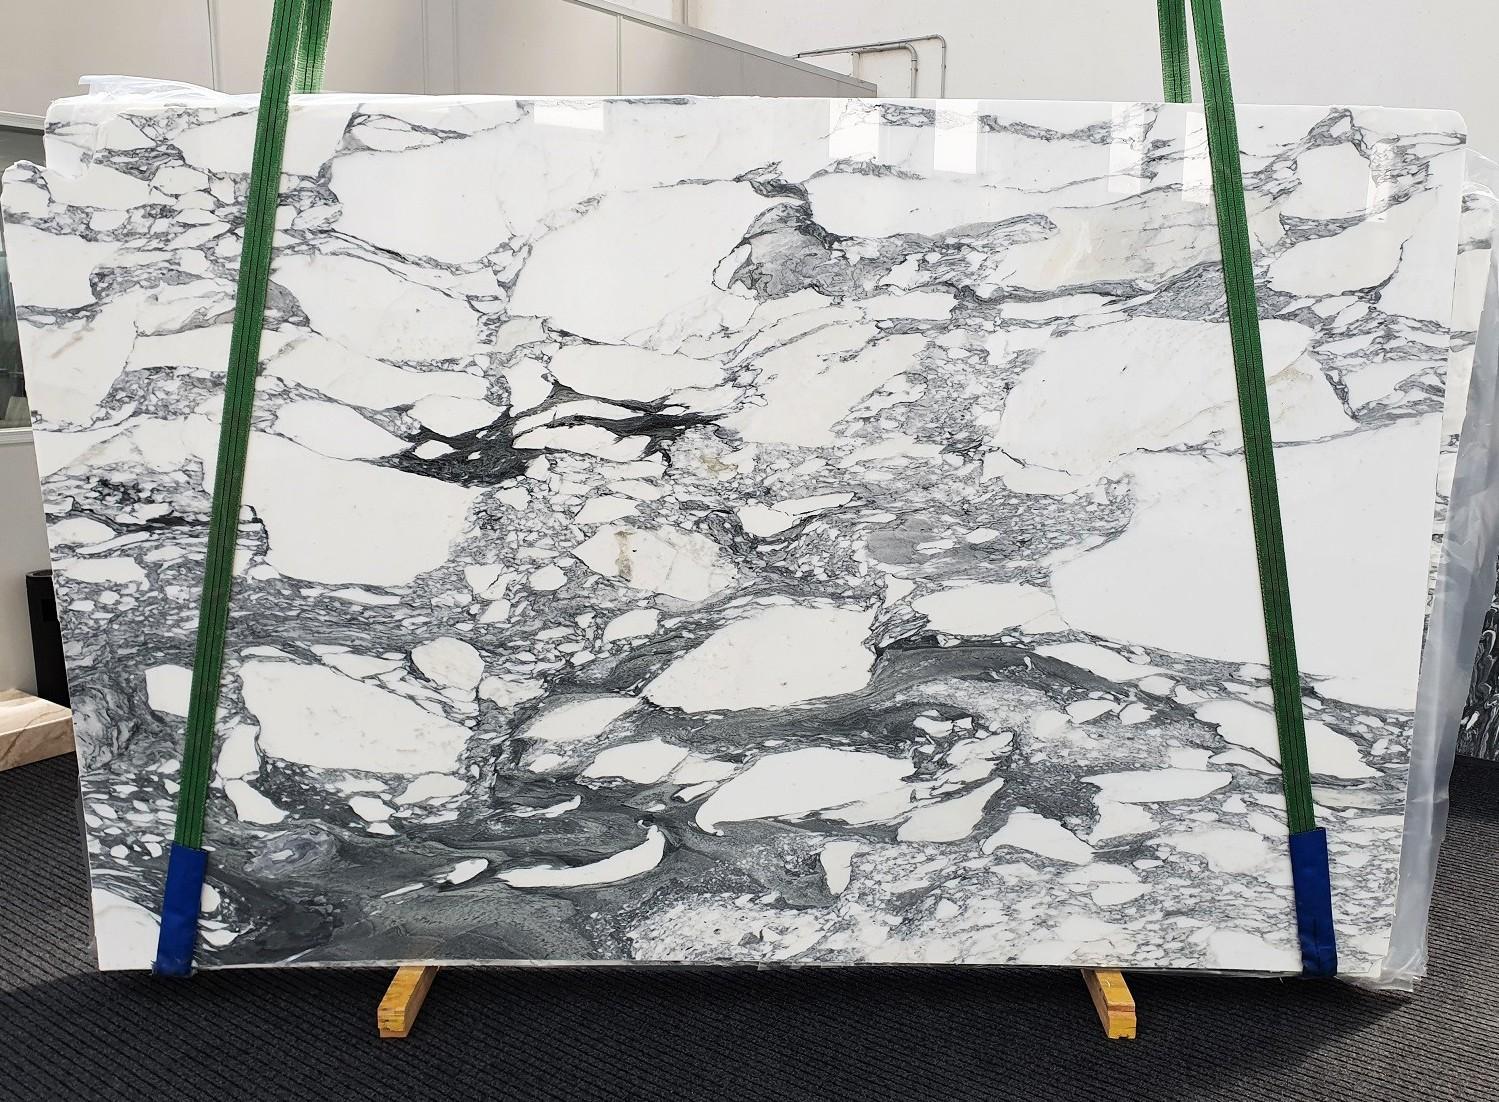 ARABESCATO CORCHIA polierte Unmaßplatten 1433 aus Natur Marmor , Slab #25: Lieferung Veneto, Italien